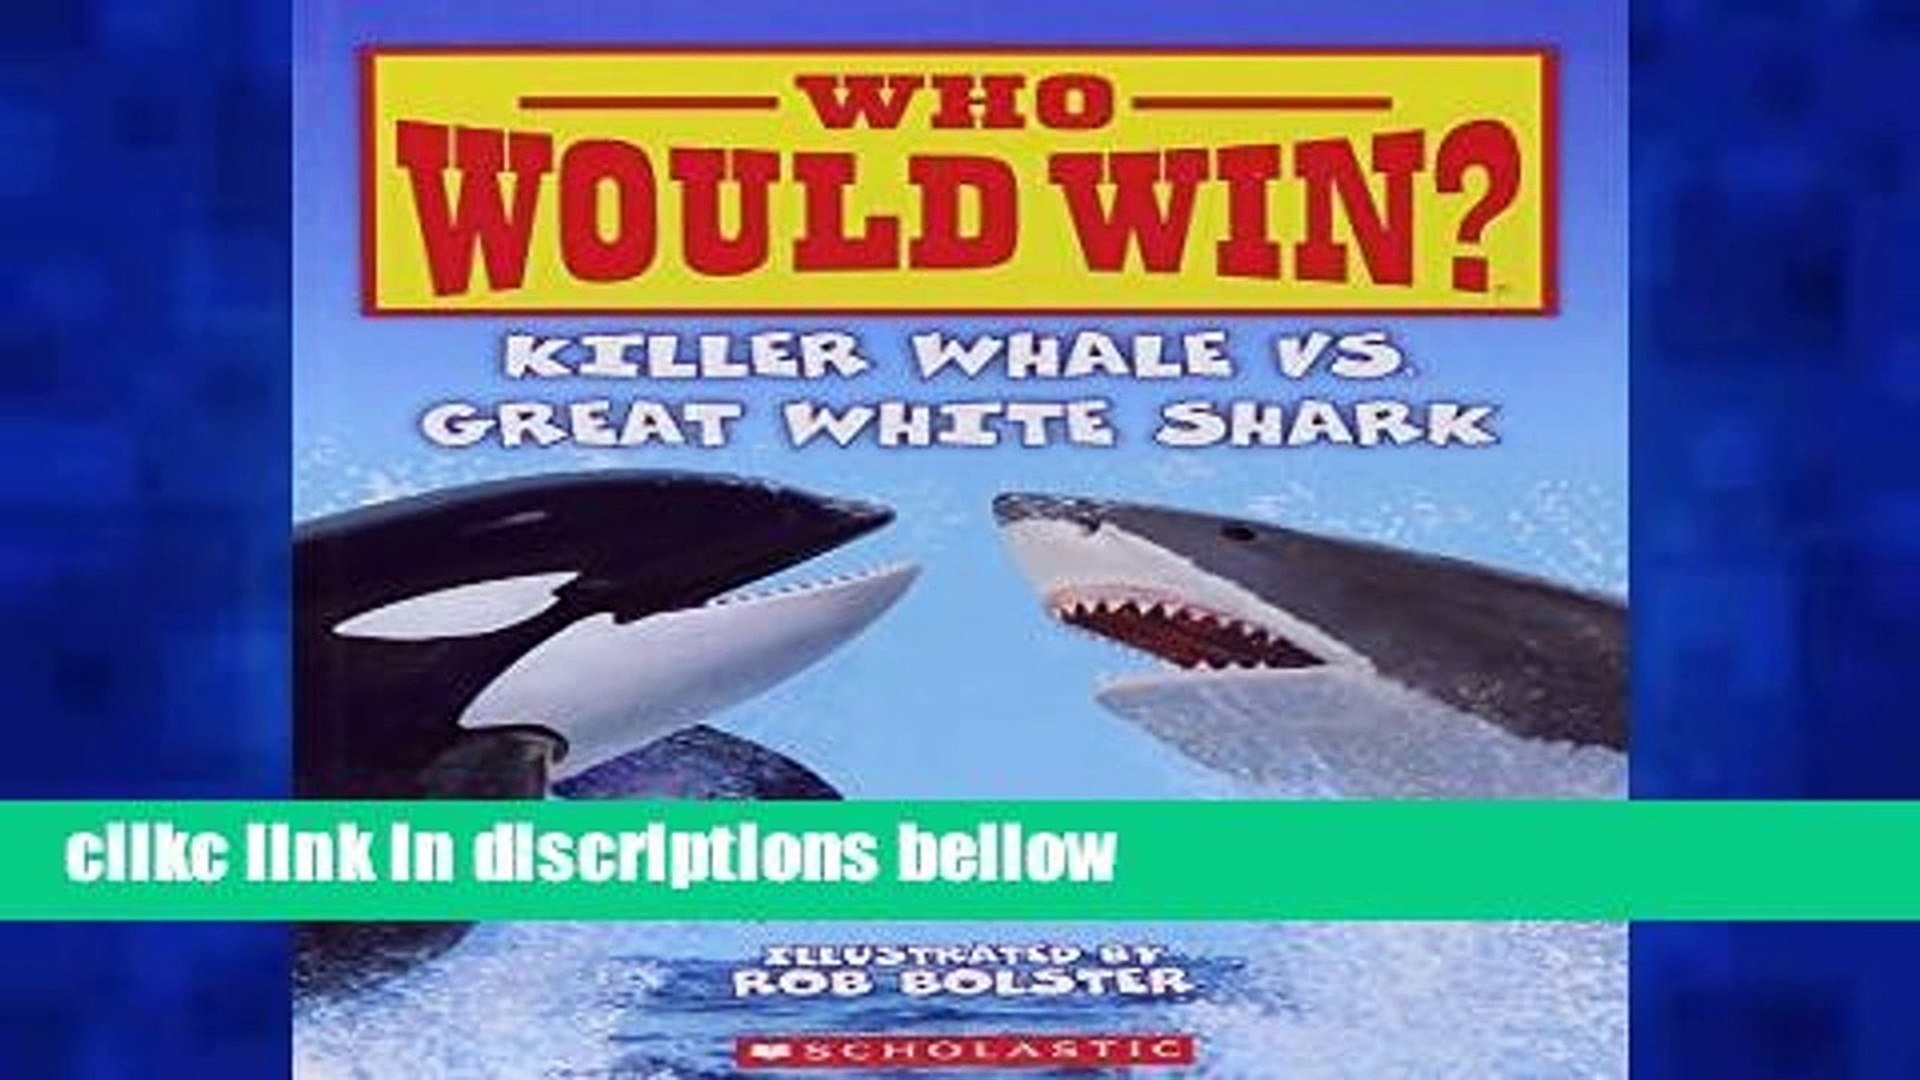 [P D F] Killer Whale vs  Great White Shark (Who Would Win?) [E B O O K]